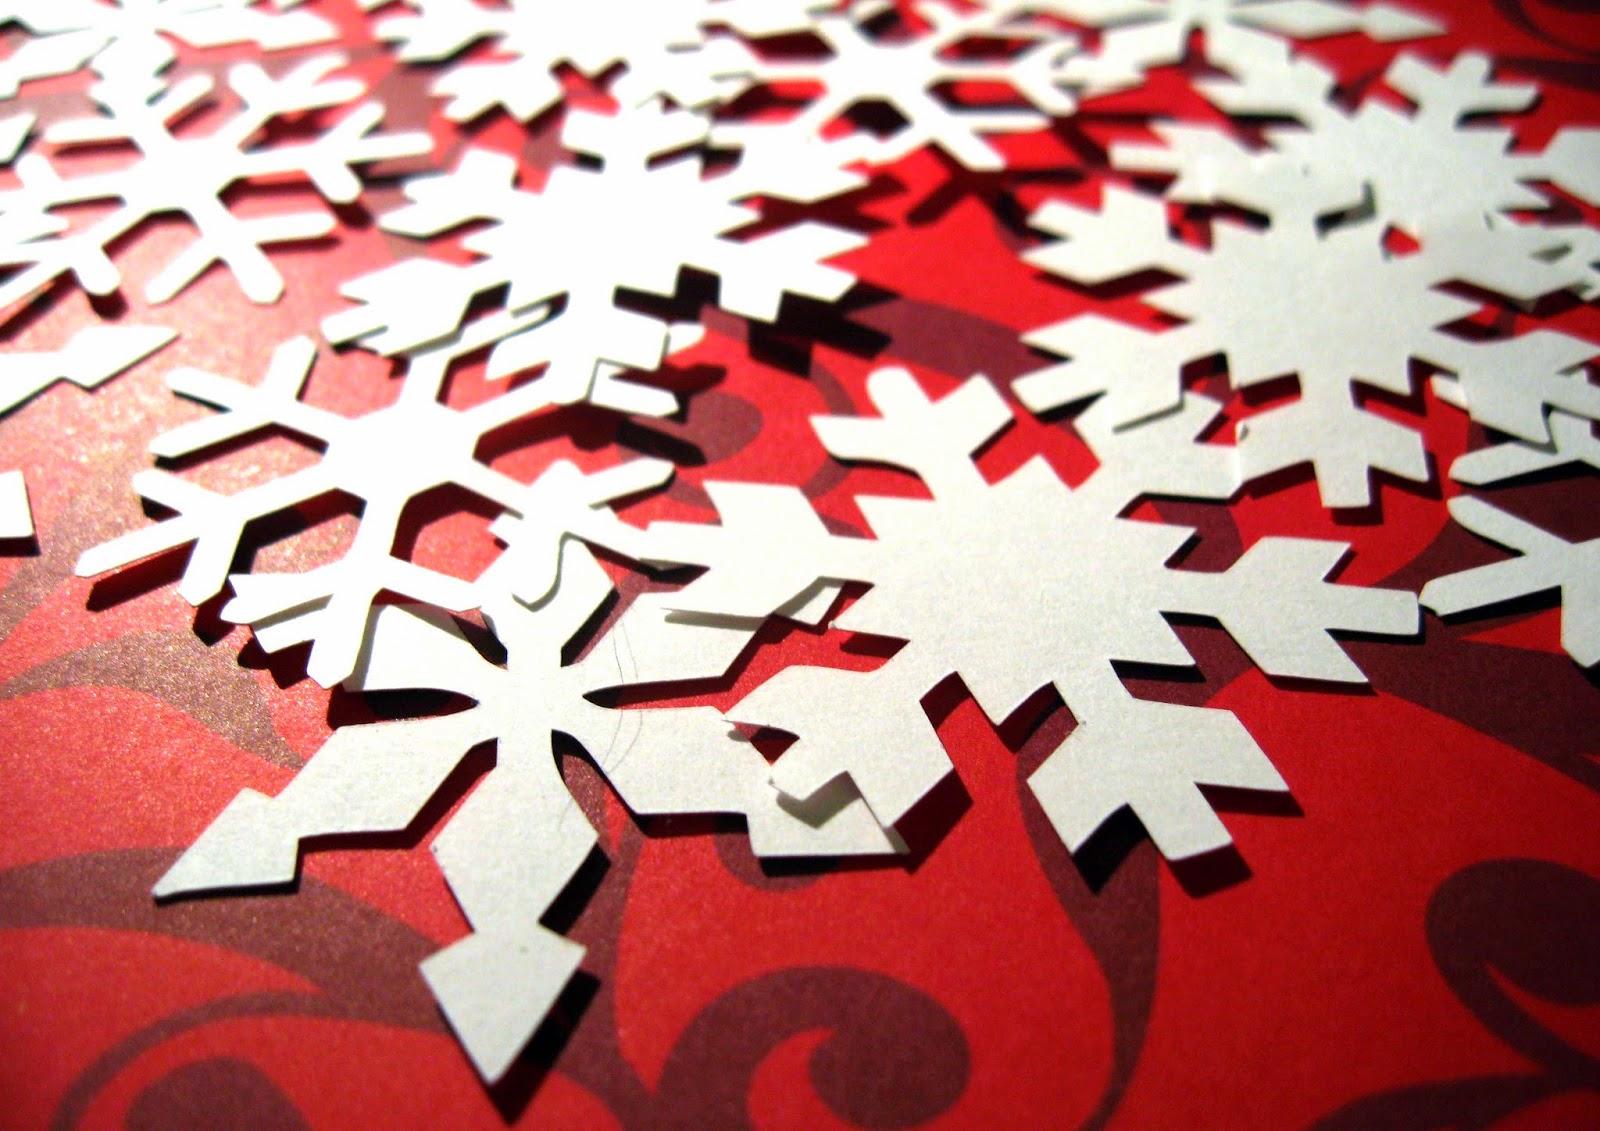 http://www.tiffzippy.com/snowflake-confetti/